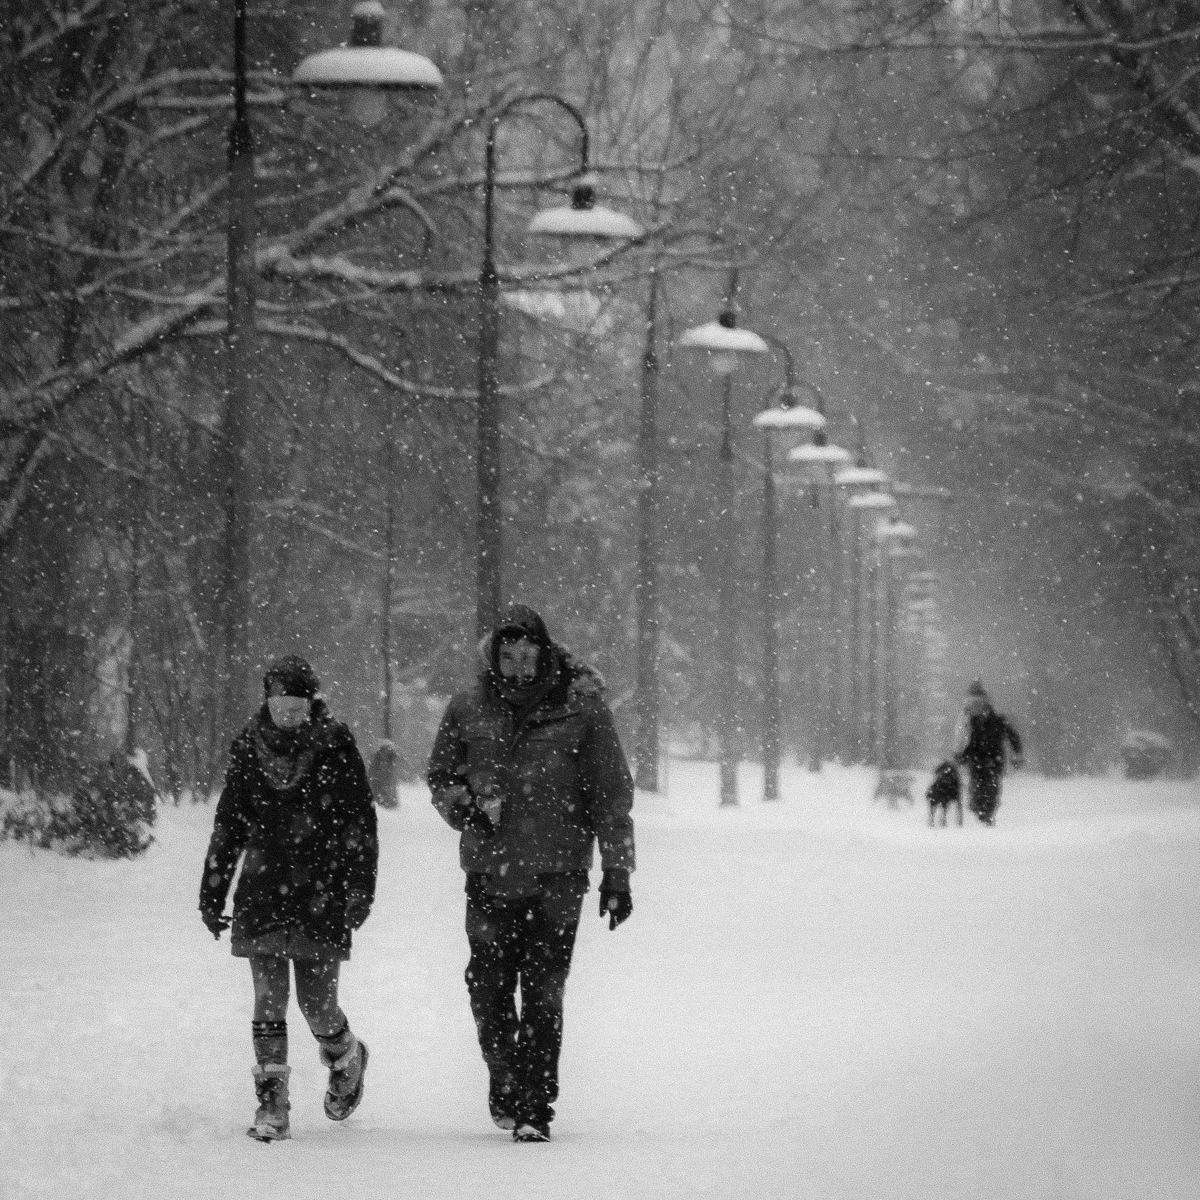 Snow falling by Salam Yahya